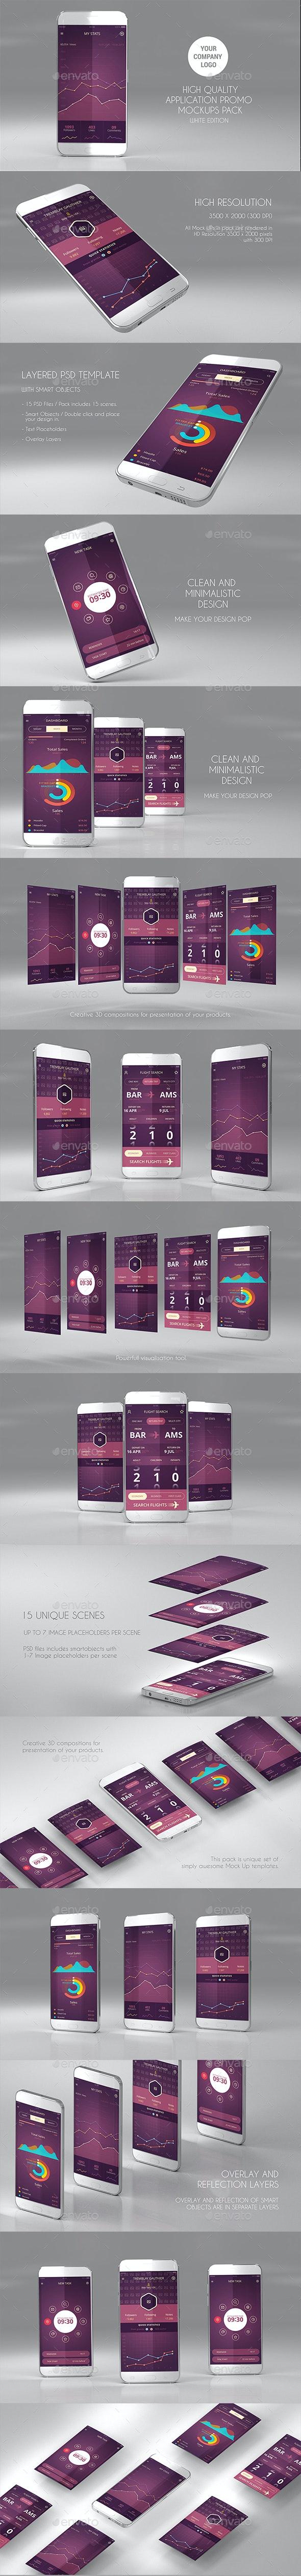 15 App Promo Mock Ups Pack (White Edition) - Mobile Displays